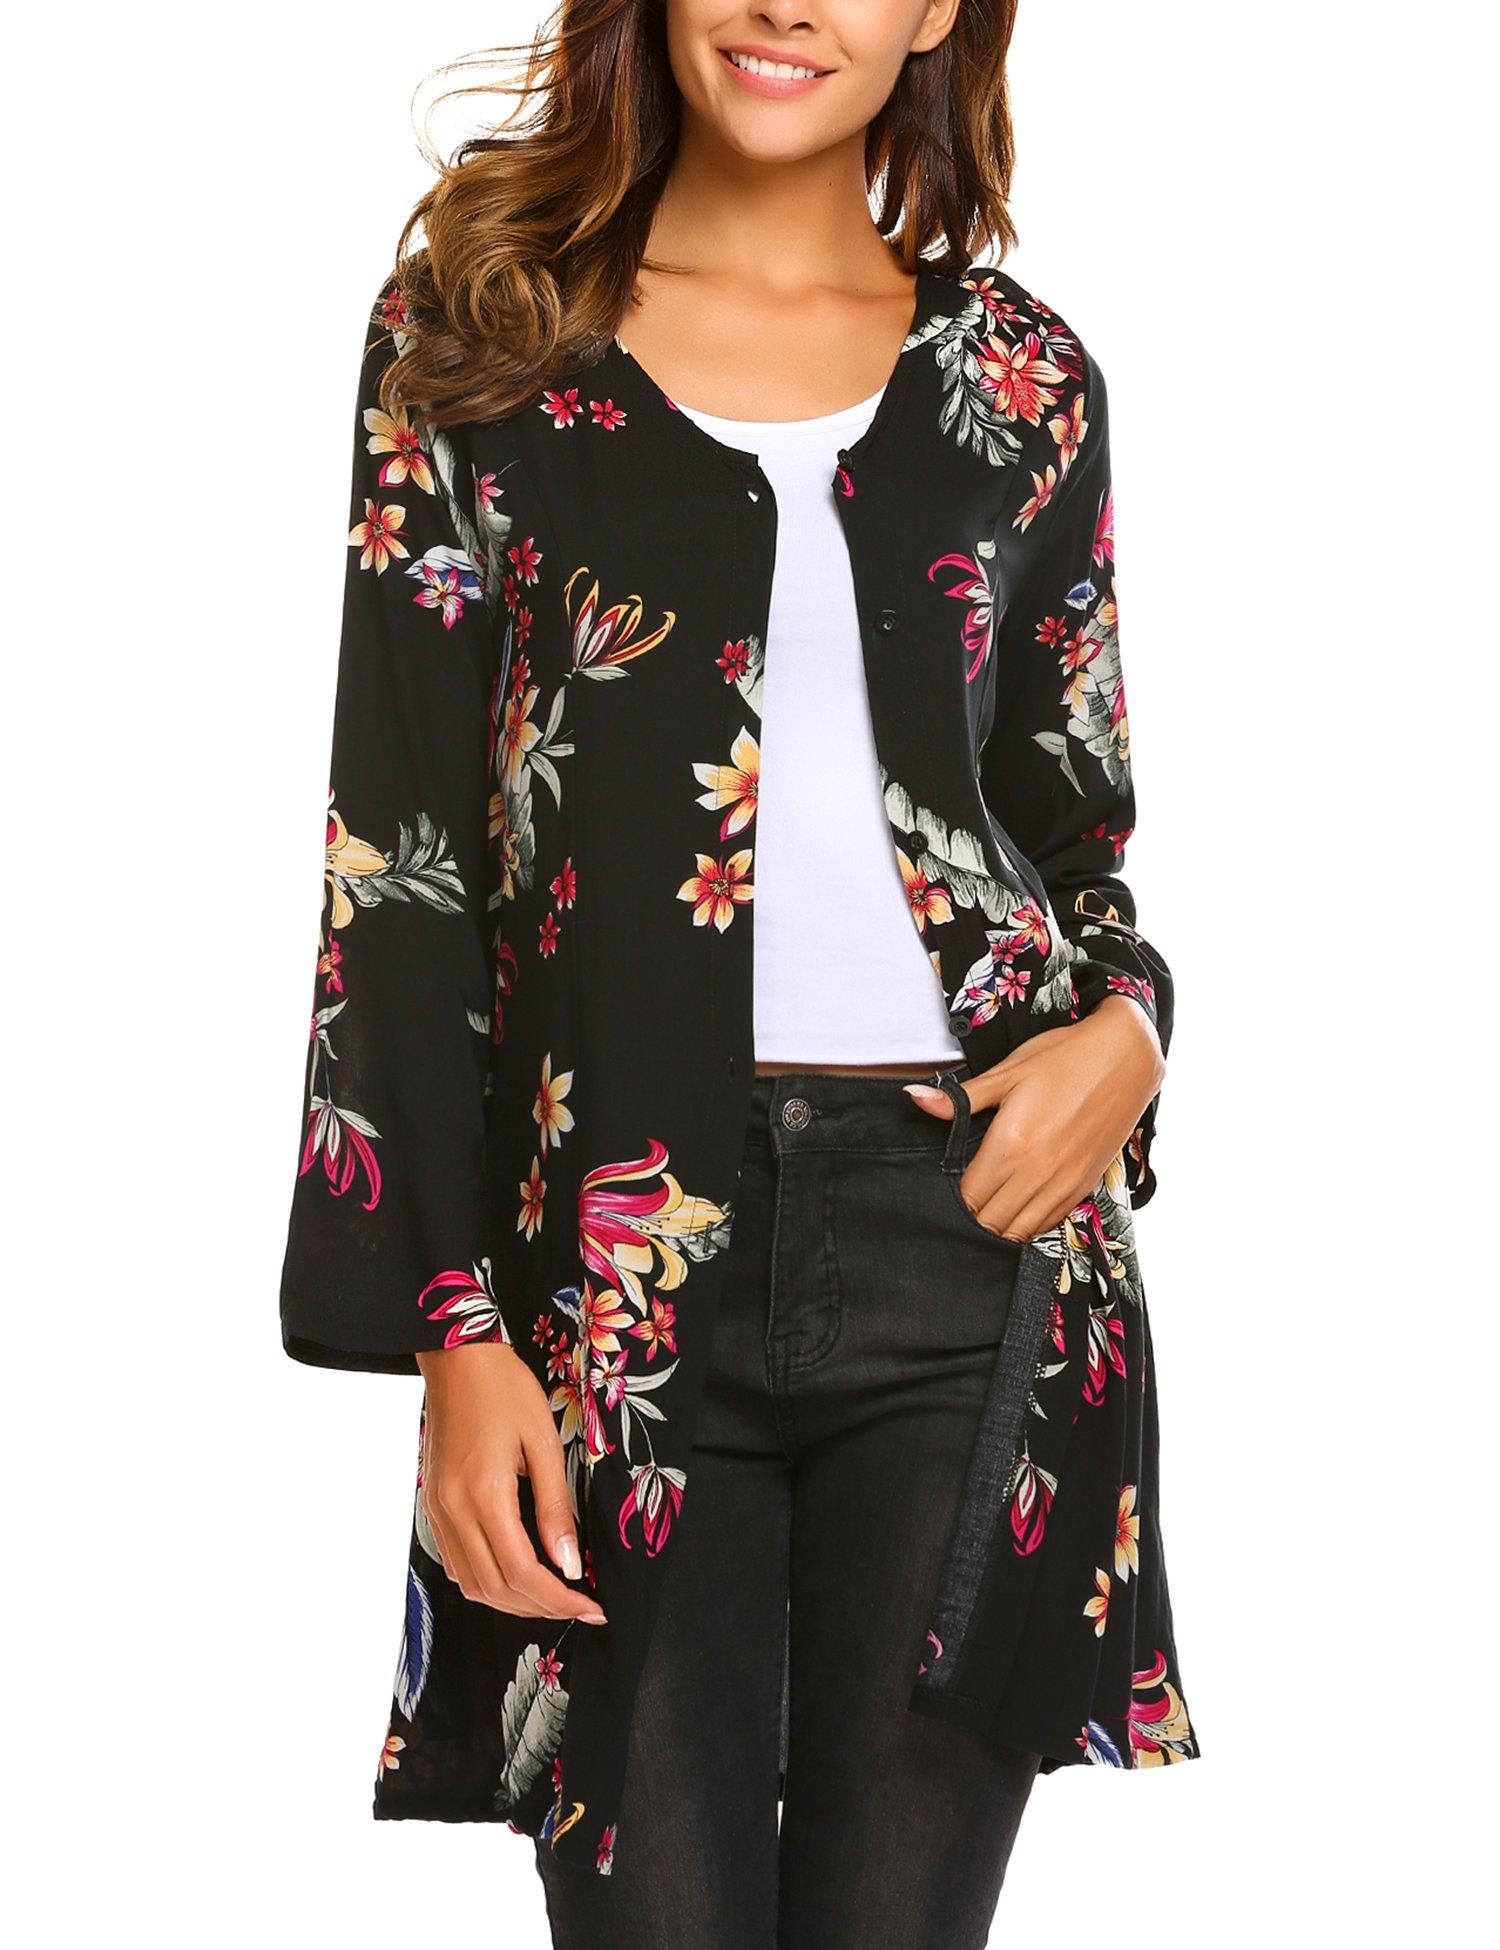 Beyove Women's Floral Pattern Long Sleeve Loose Fit Tunic Dress, X-Large, A Pat2